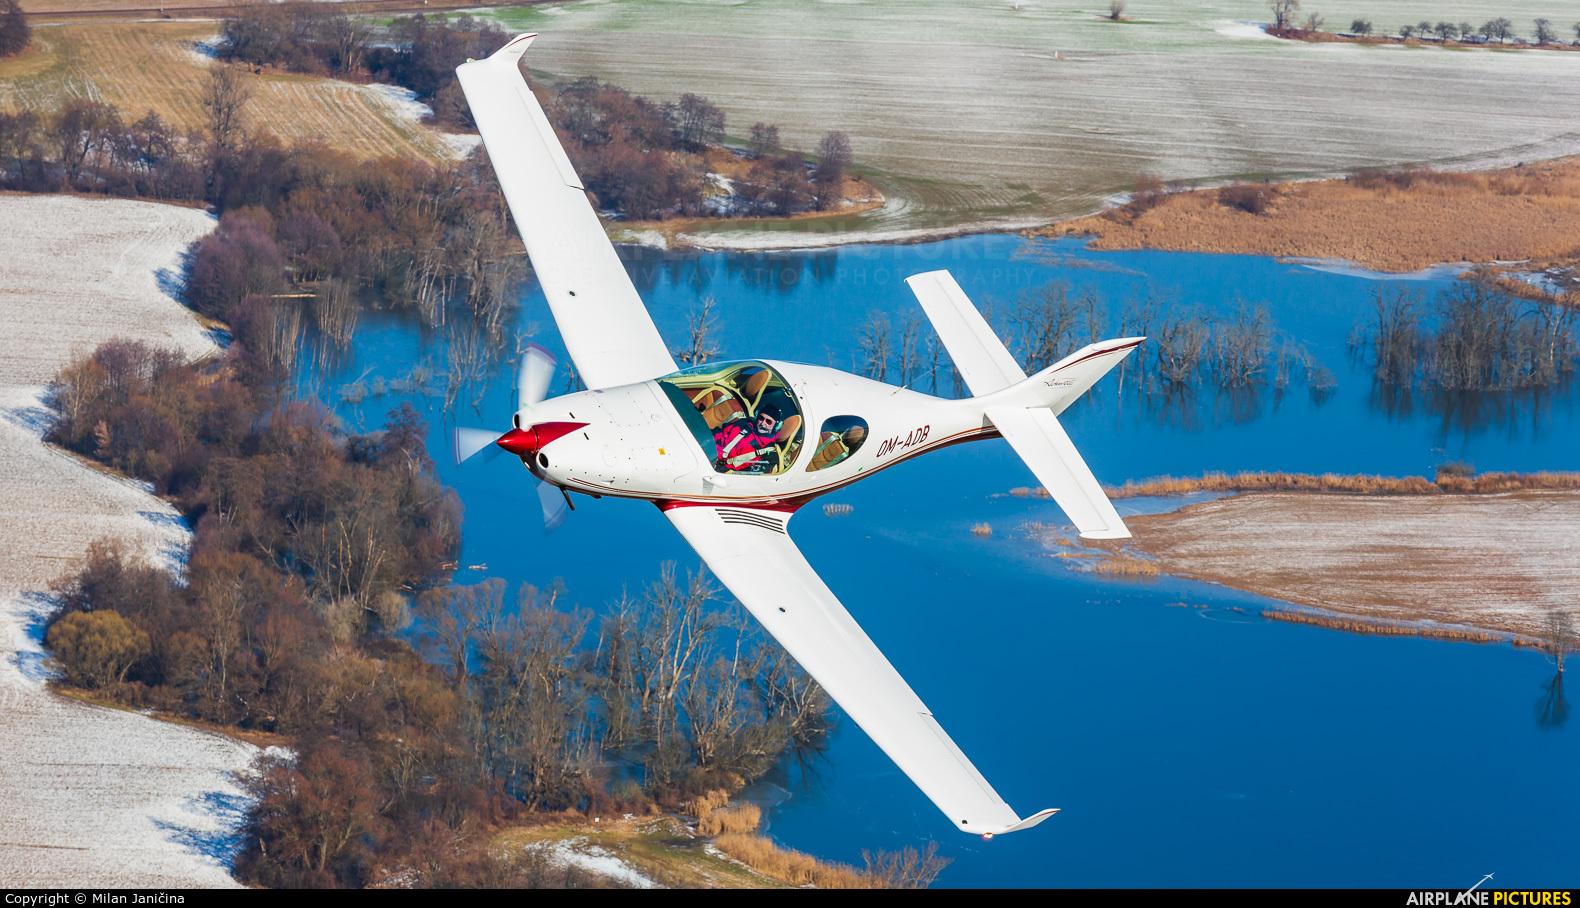 Aerospool OM-ADB aircraft at In Flight - Slovakia